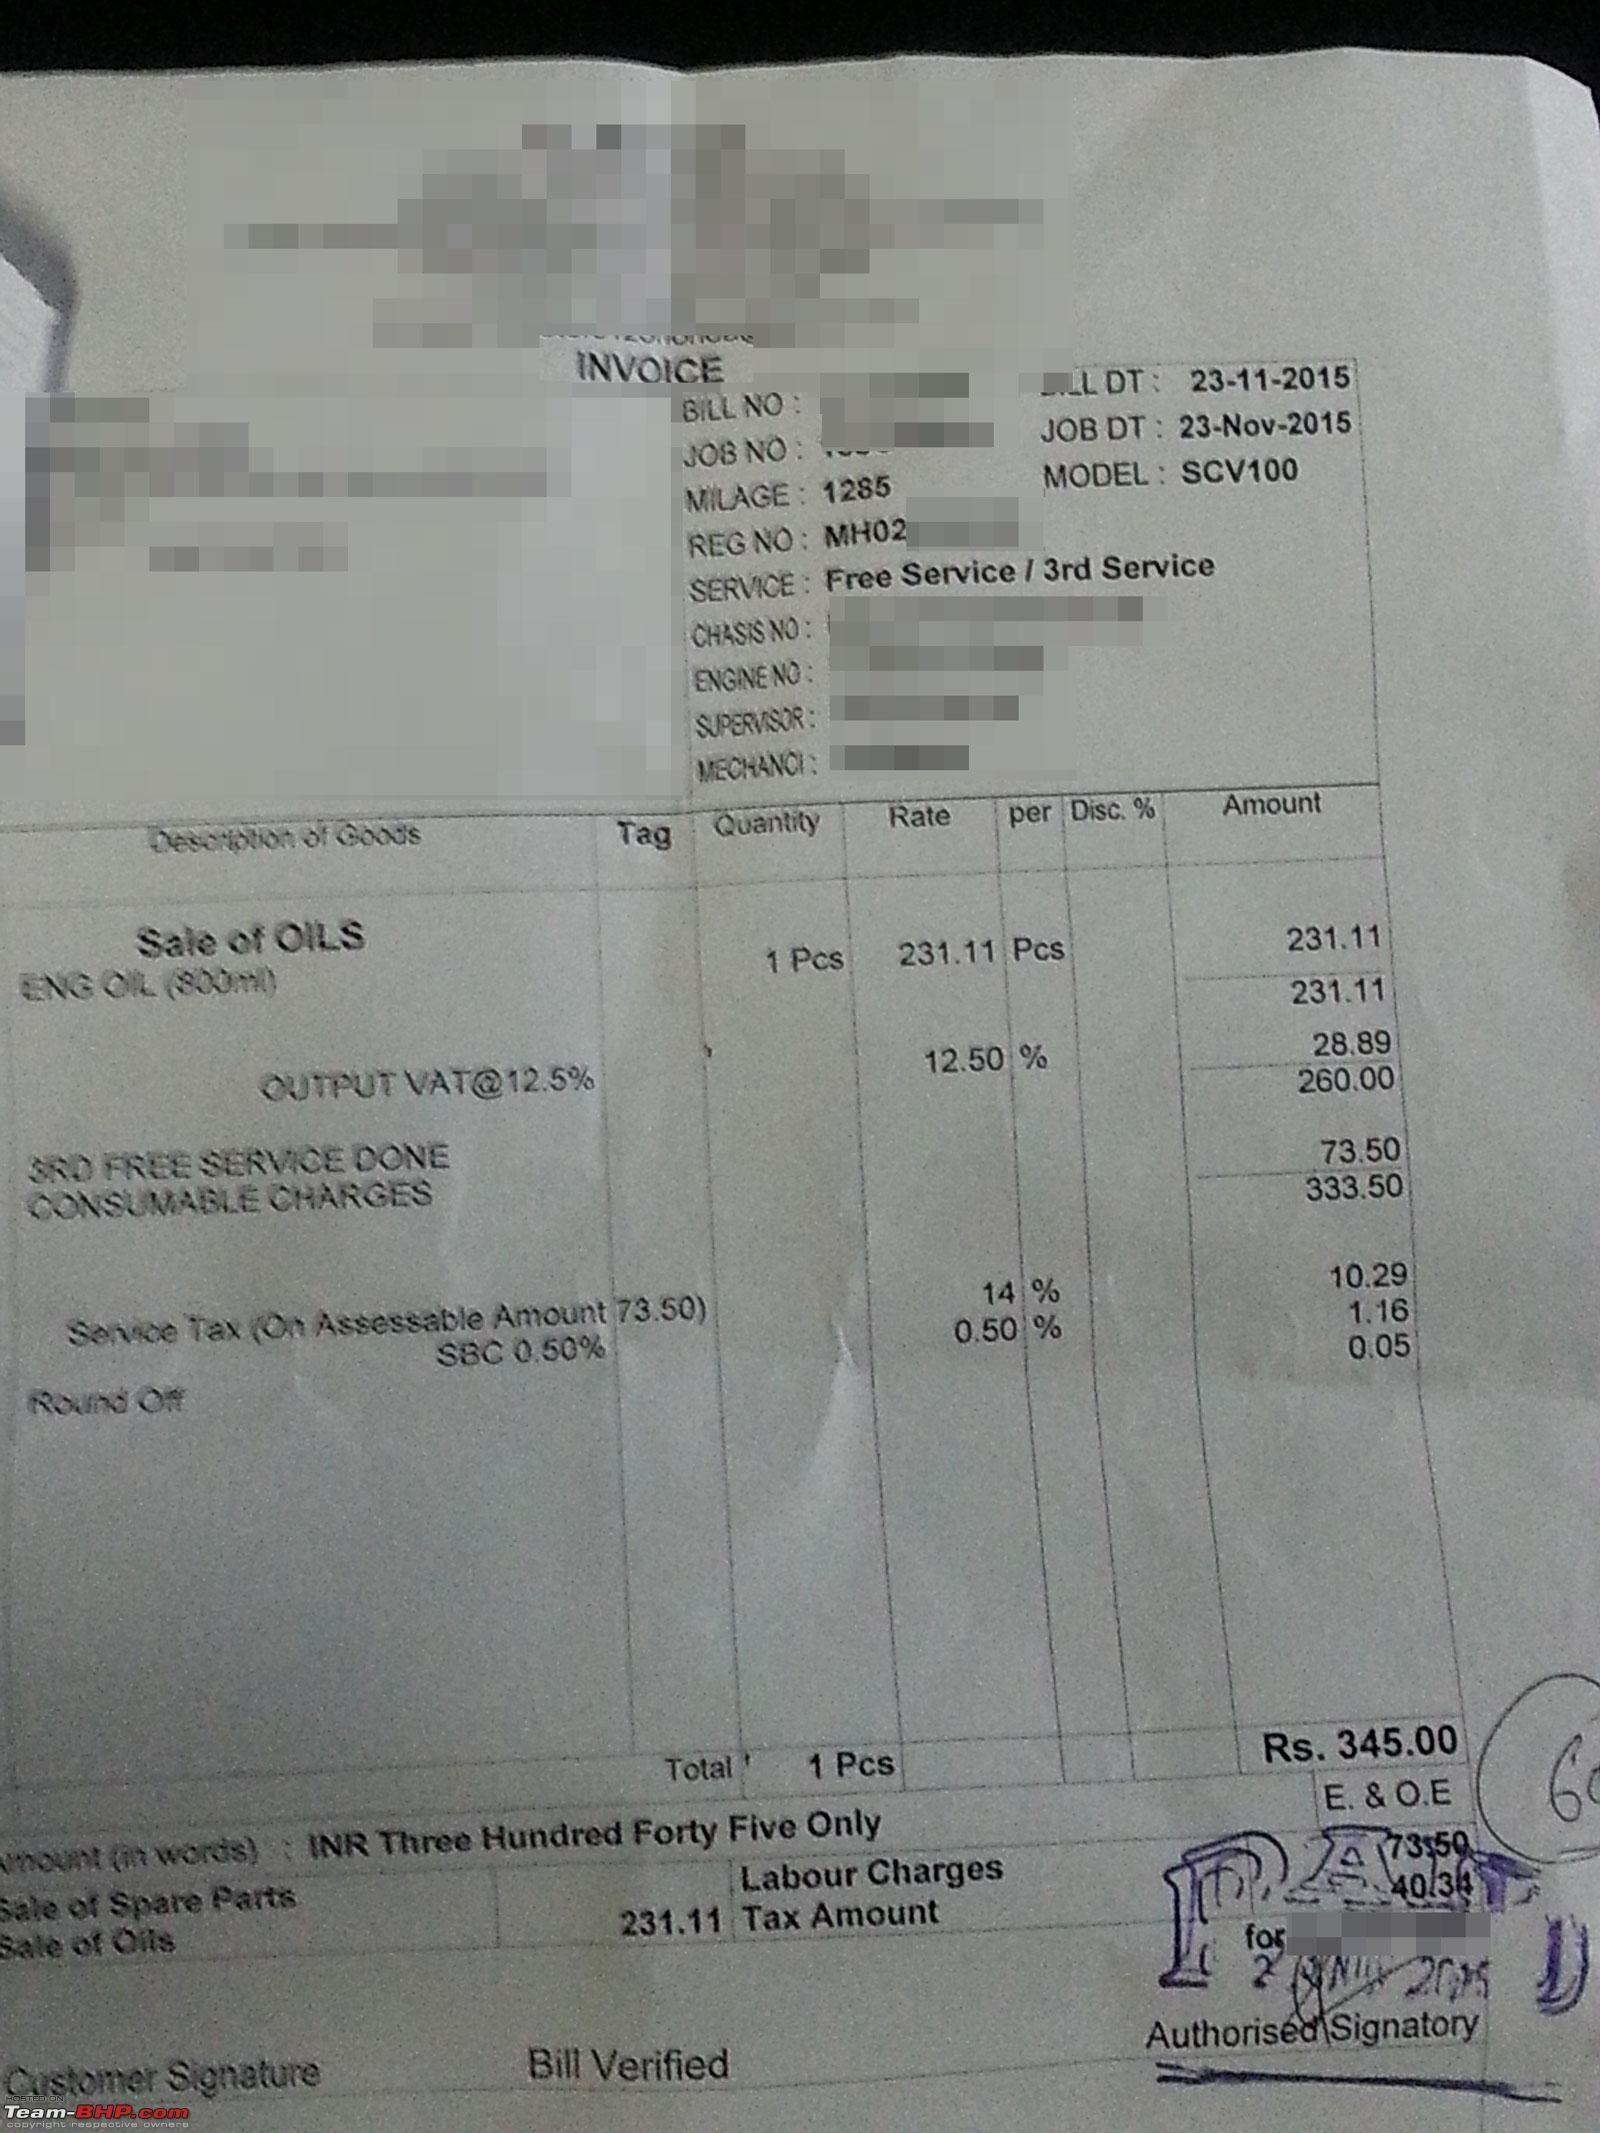 vl motors santacruz honda 2 wheeler service centre honda activa invoice details